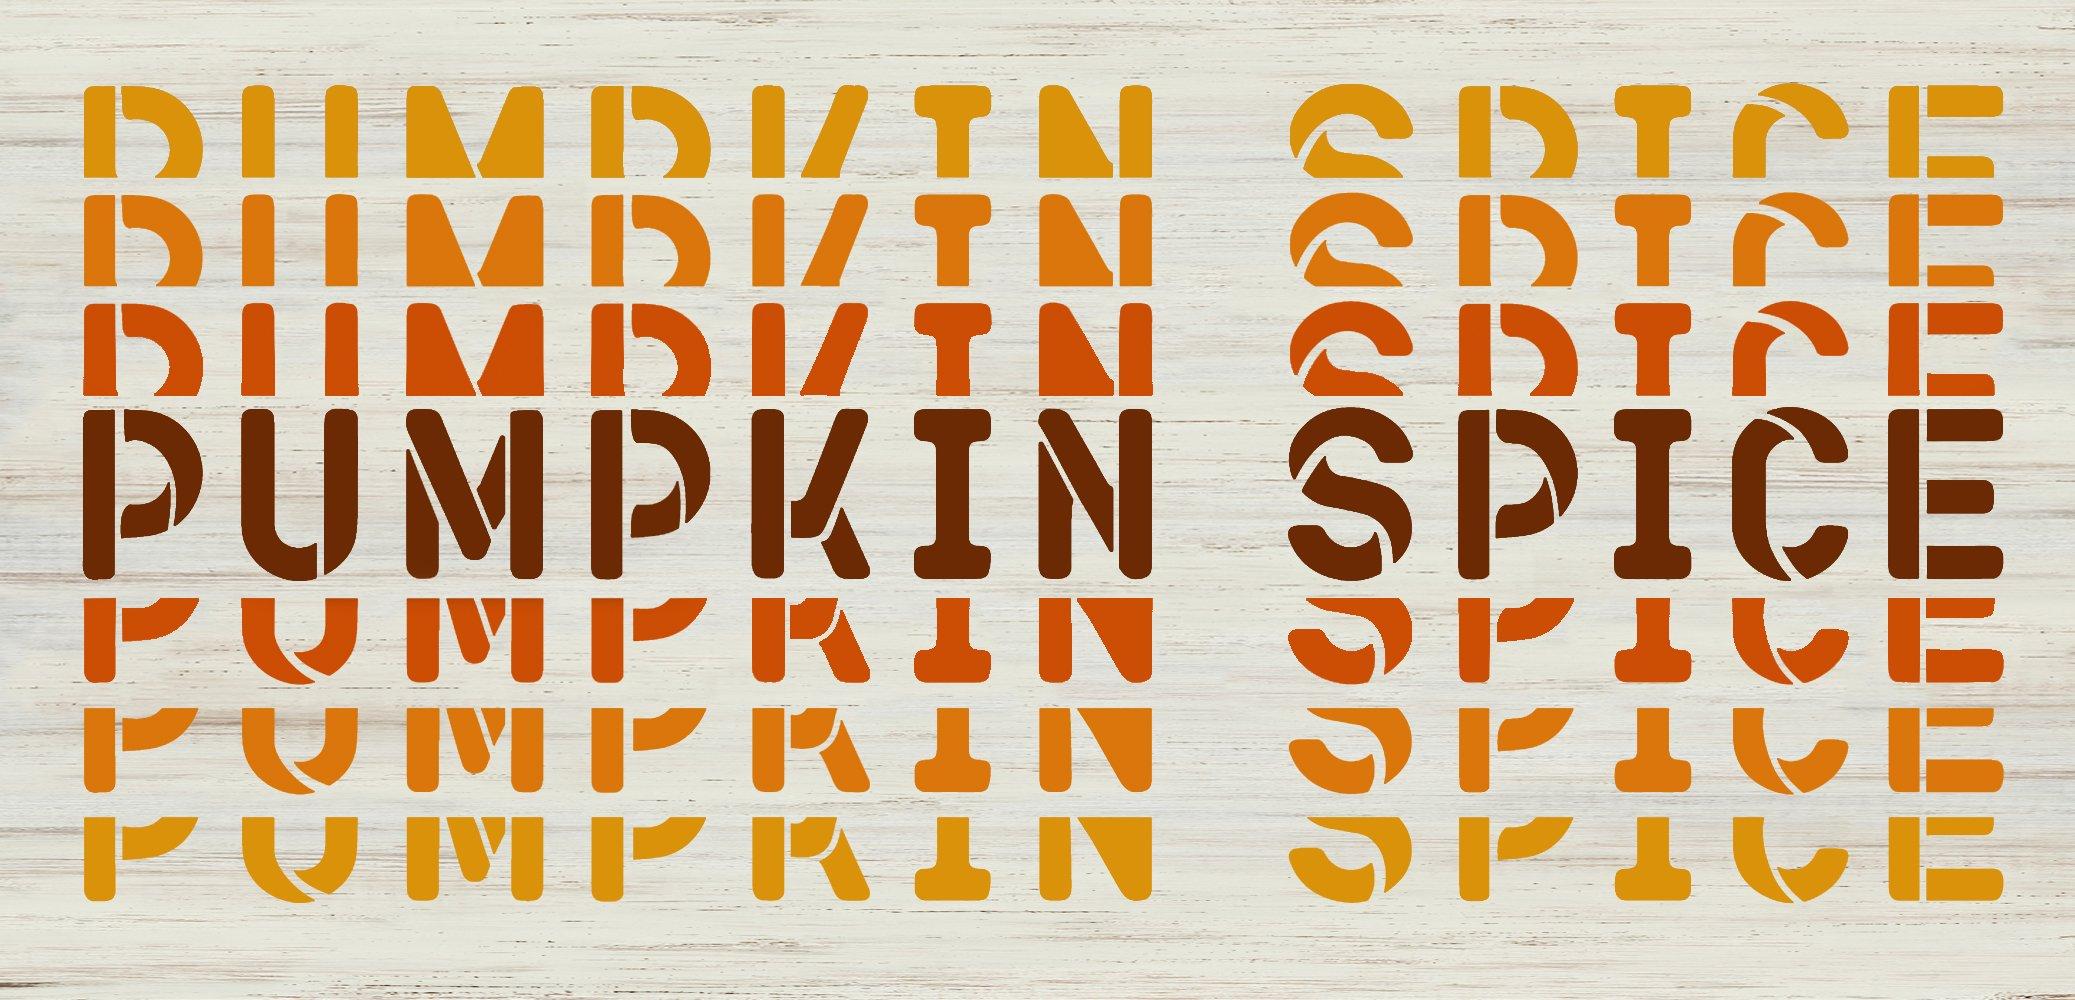 Pumpkin Spice Gradient Echo Word Art Stencil by StudioR12   DIY Fall Autumn Home Decor   Craft & Paint Wood Sign Reusable Mylar Template   Select Size